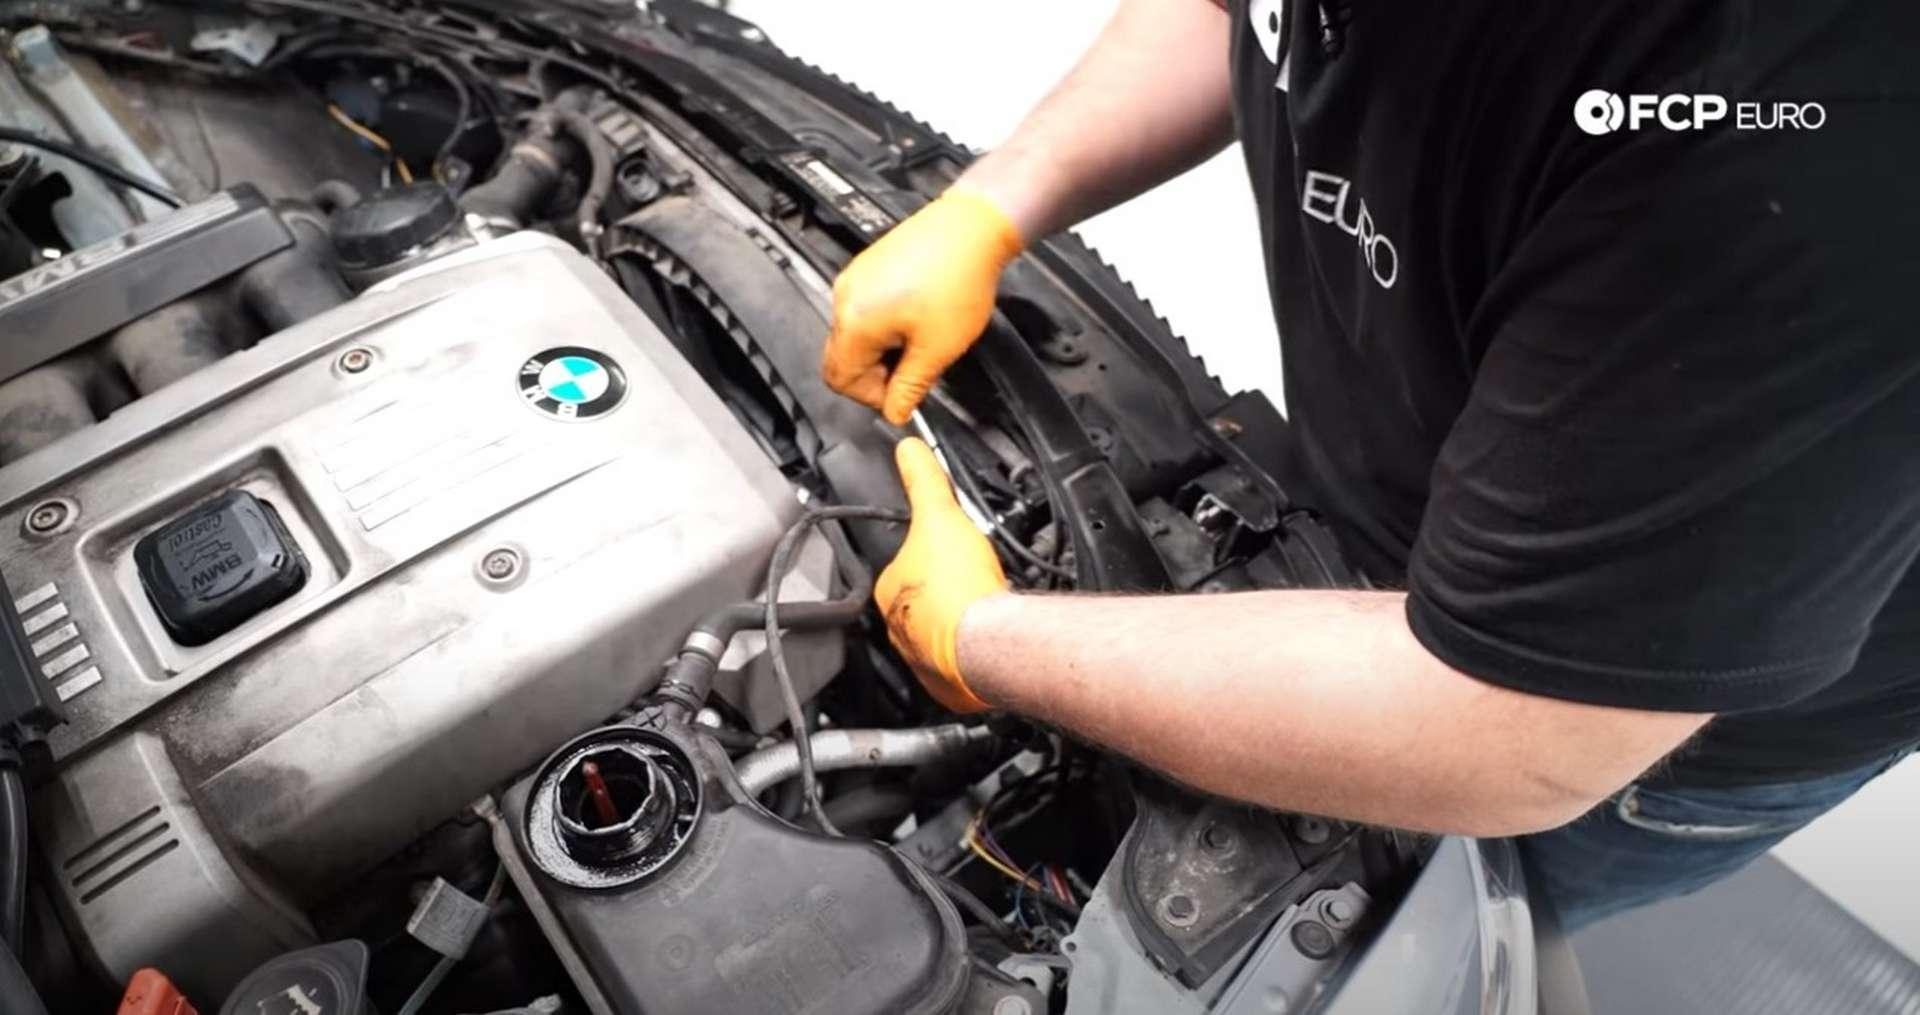 DIY BMW N52 Drive Belt Replacement installing the fan shroud fastener